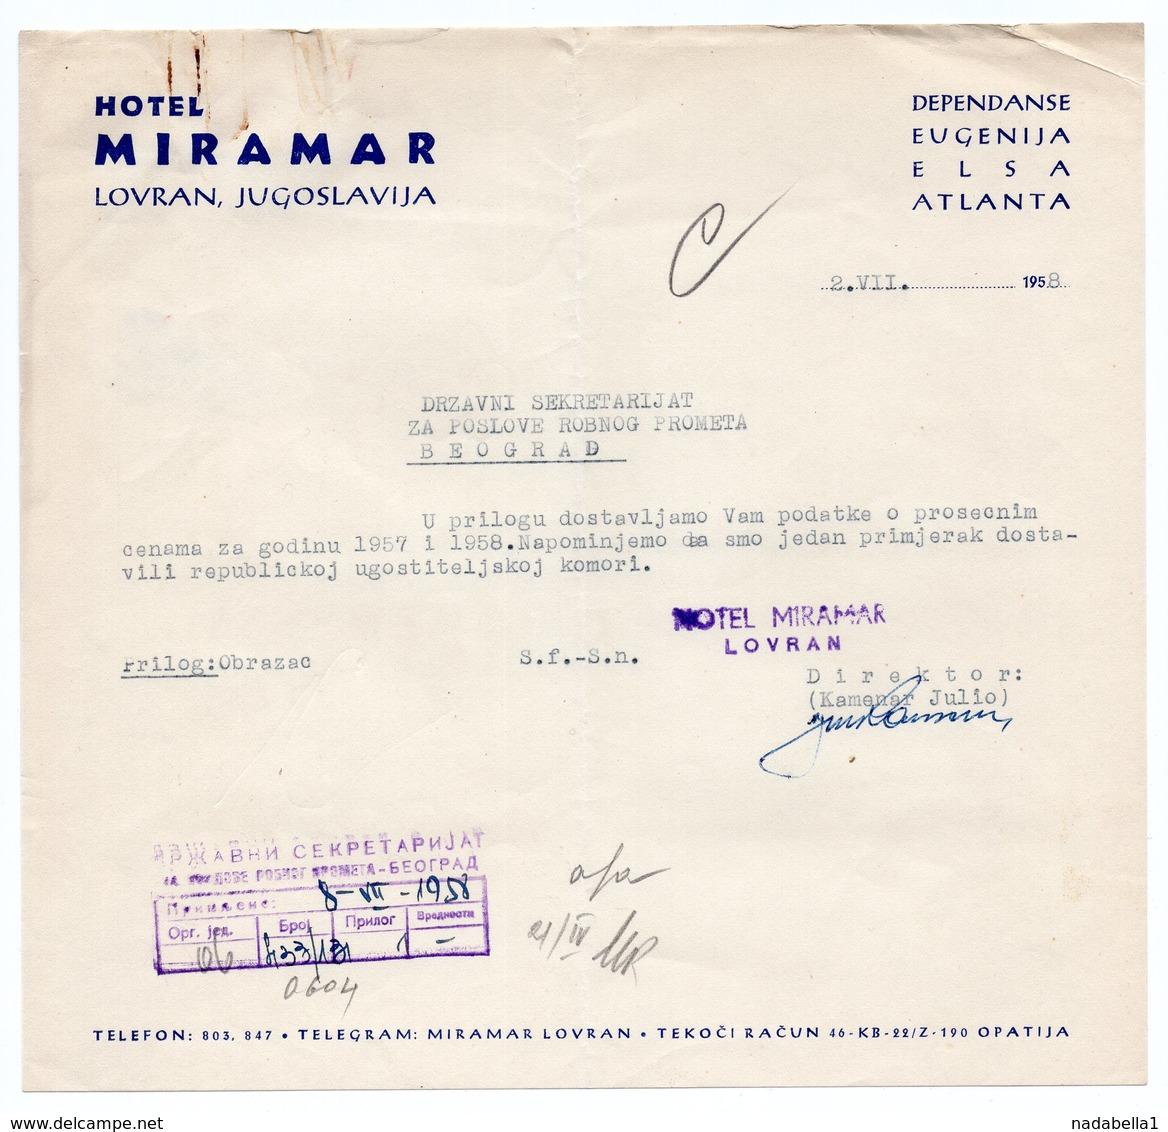 1958 YUGOSLAVIA, CROATIA, LOVRAN, HOTEL MIRAMAR, LETTERHEAD - Invoices & Commercial Documents